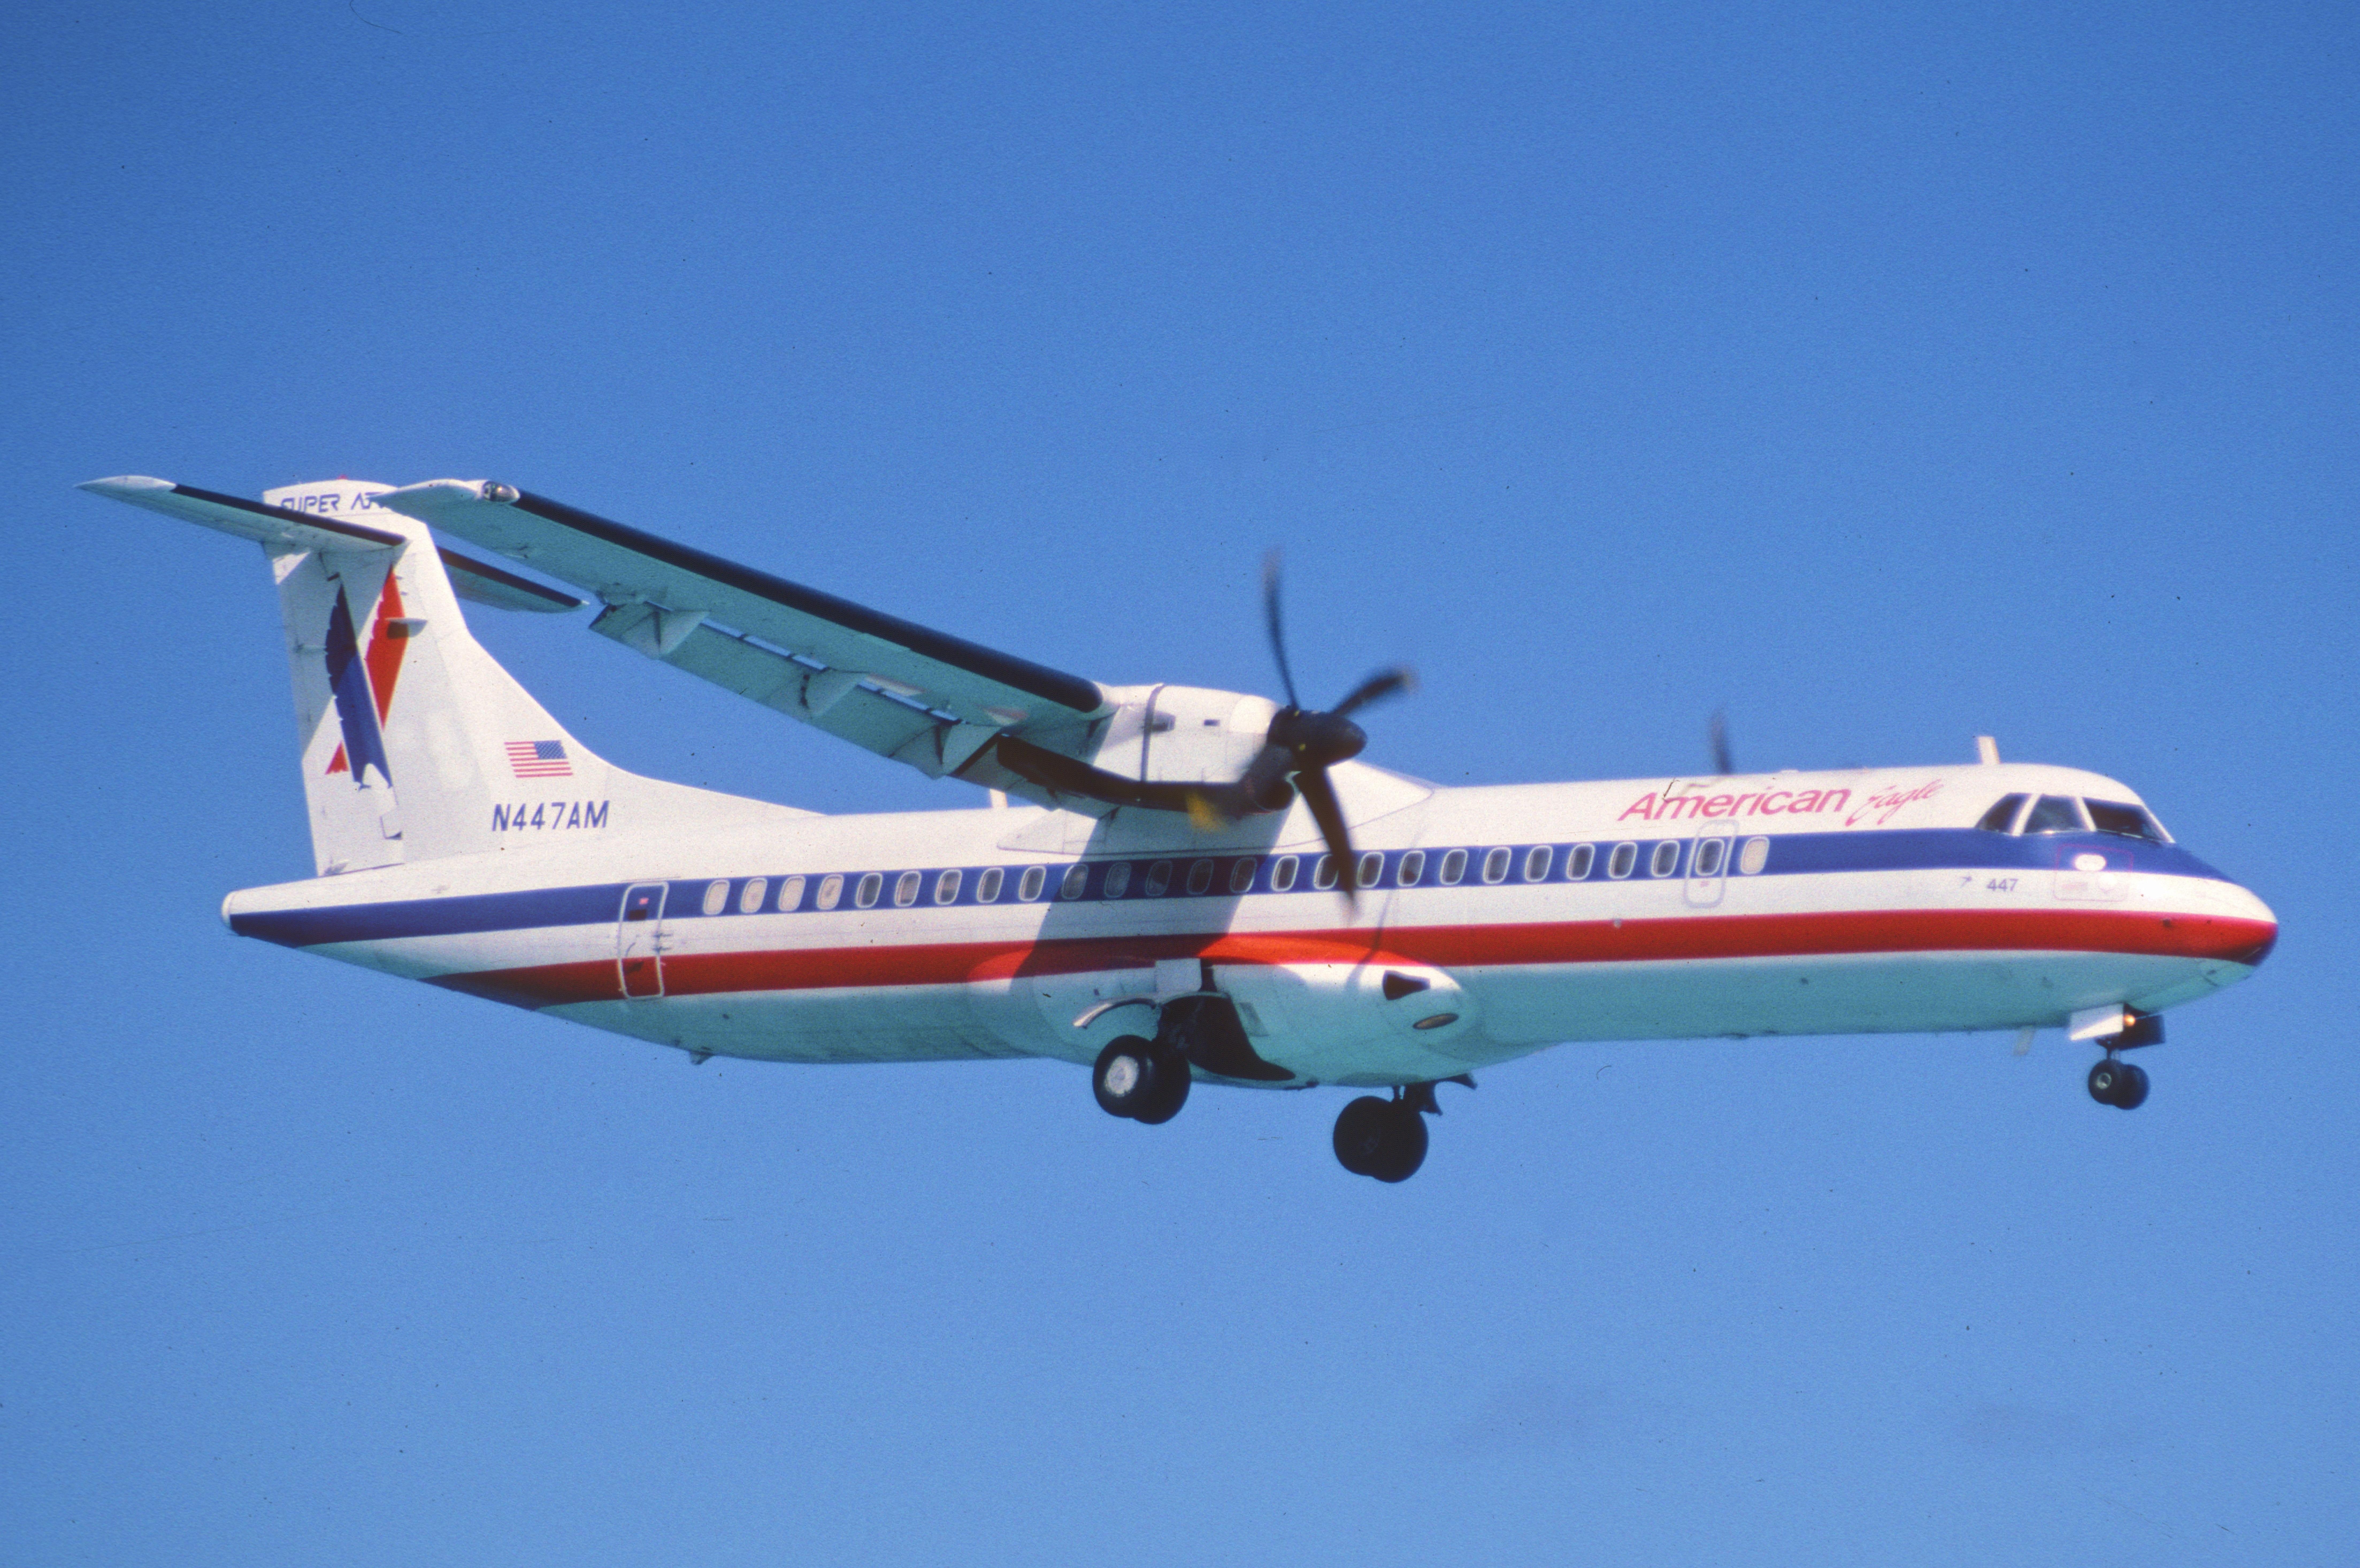 MAROC FS2004 TÉLÉCHARGER AVION AIR ROYAL